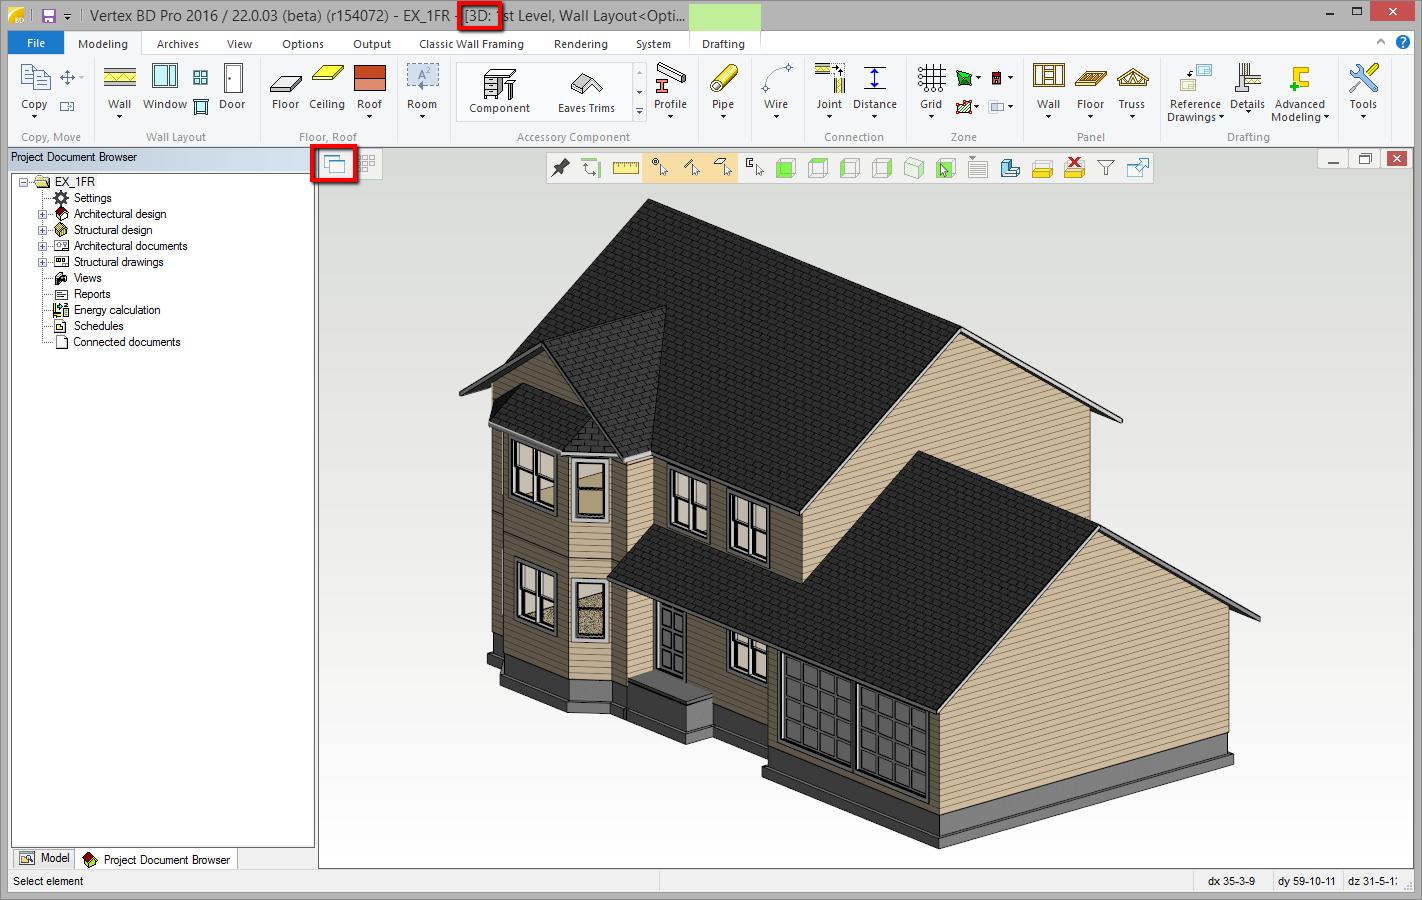 Saving 3D model as 3D PDF - Vertex BD 2018 Documentation